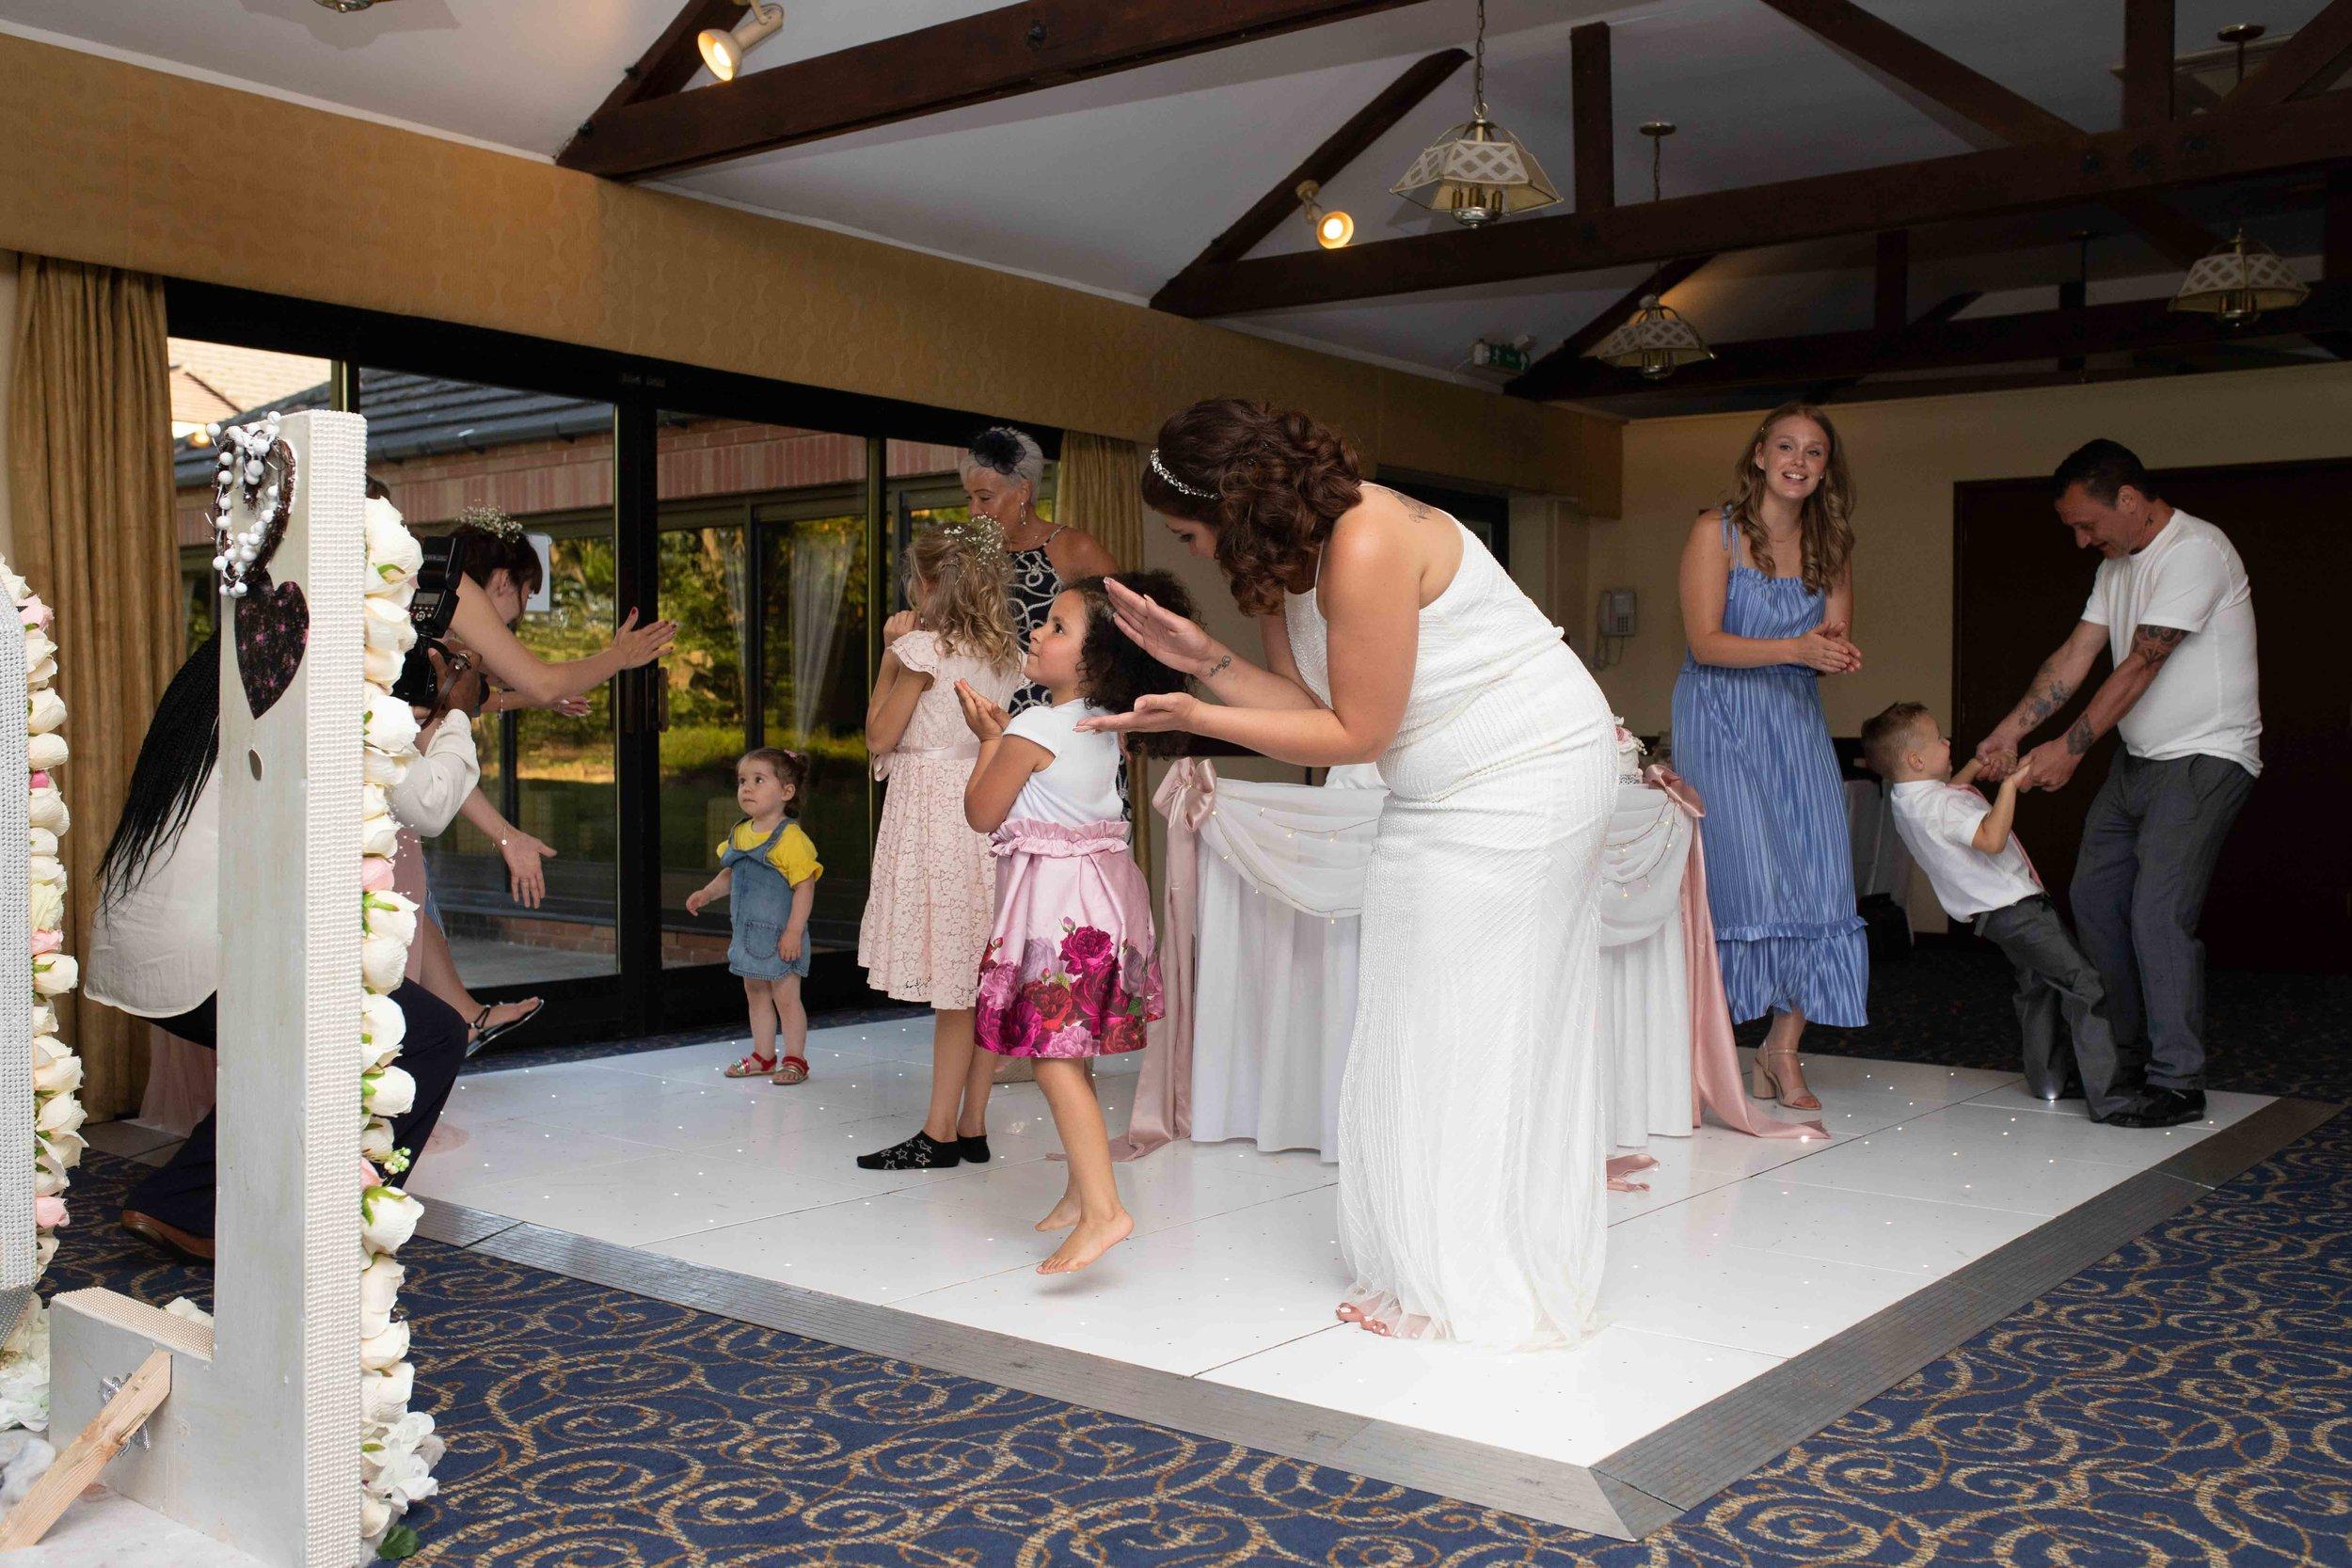 Lea-cooper-photography-wedding-photography-wolverhampton-patshull-park-hotel-wedding-pattingham-wolverhampton-west-midlands-uk-34.JPG